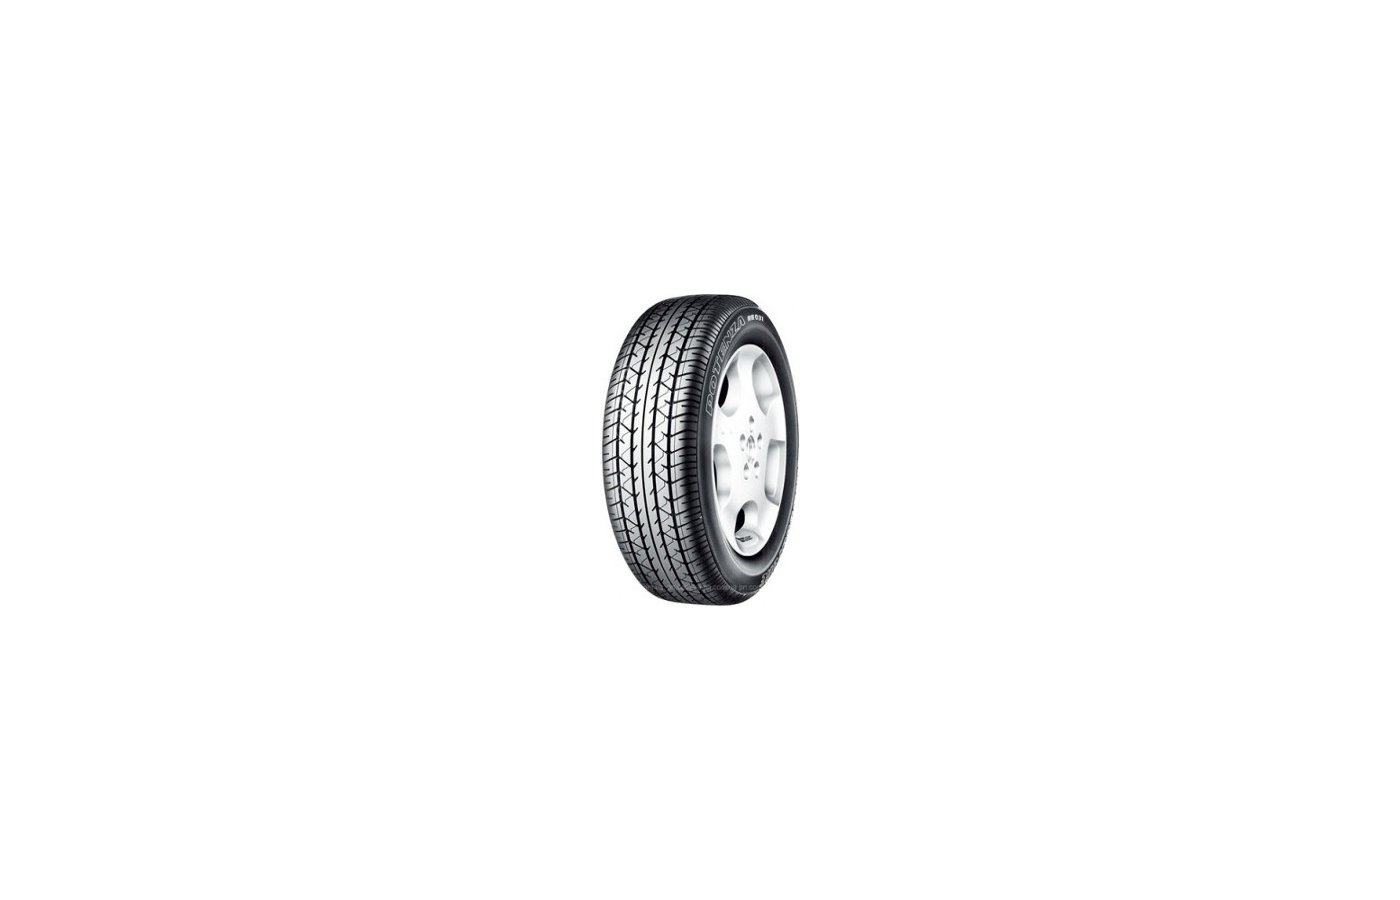 Шина Bridgestone Potenza RE031 235/55 R18 TL 99V